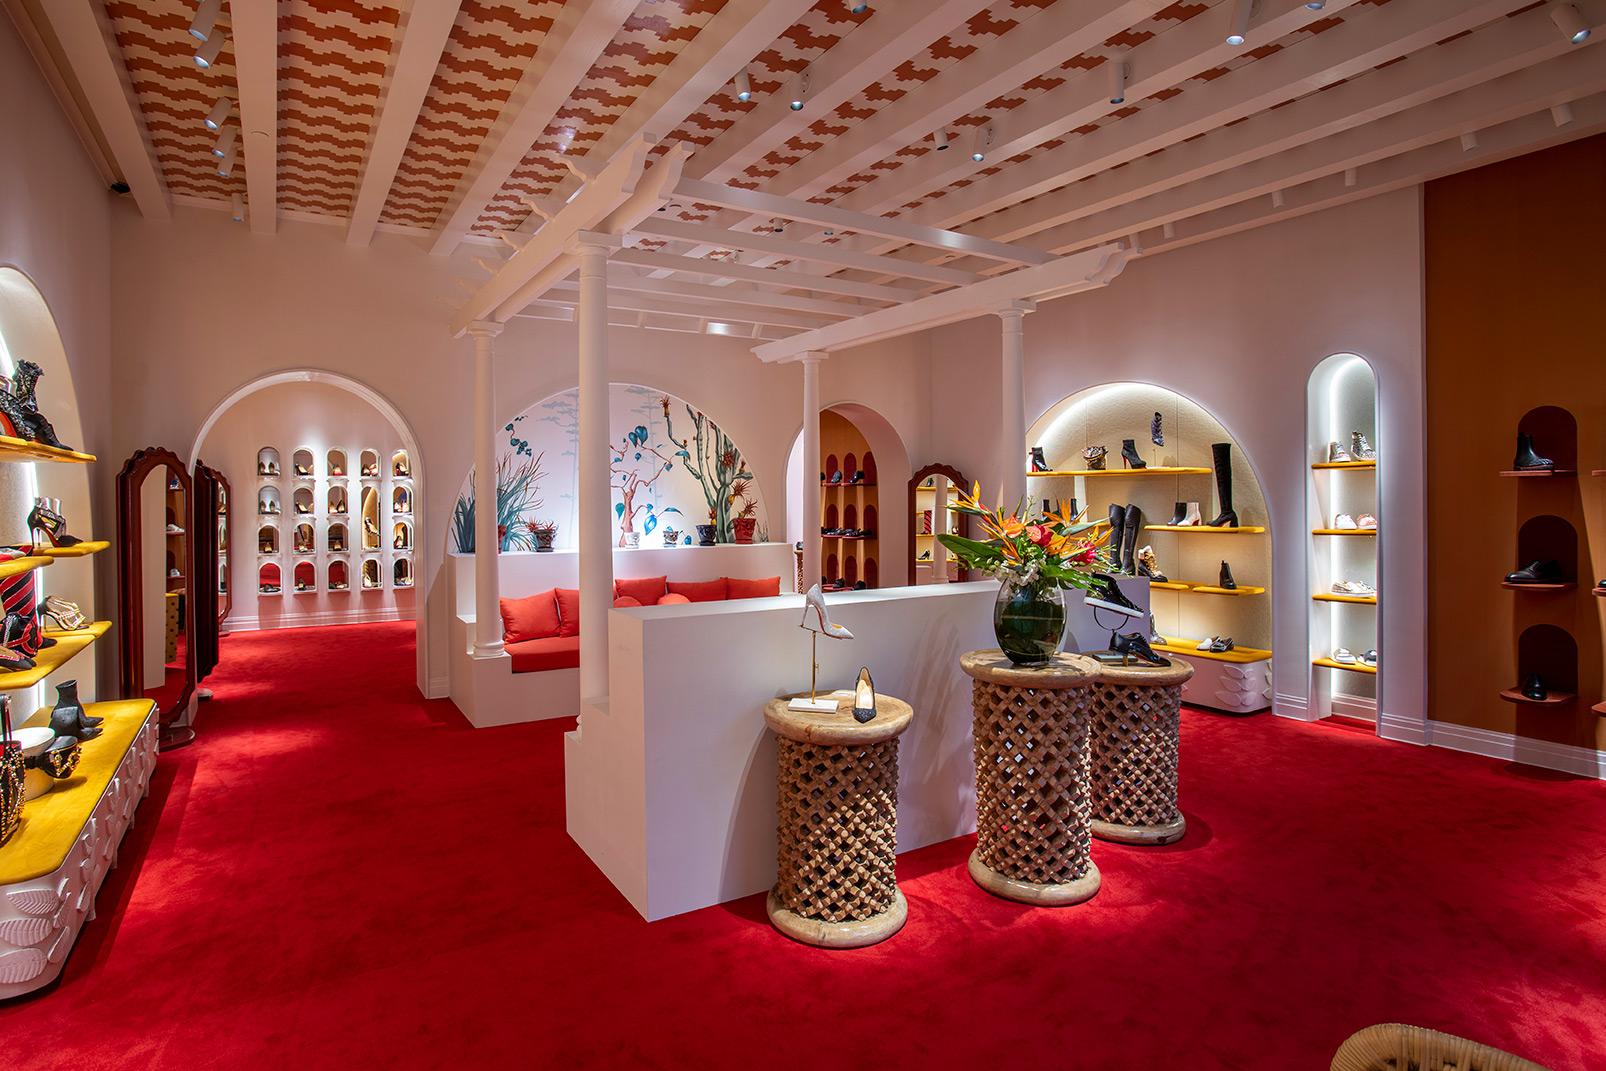 Christian Louboutin store interior